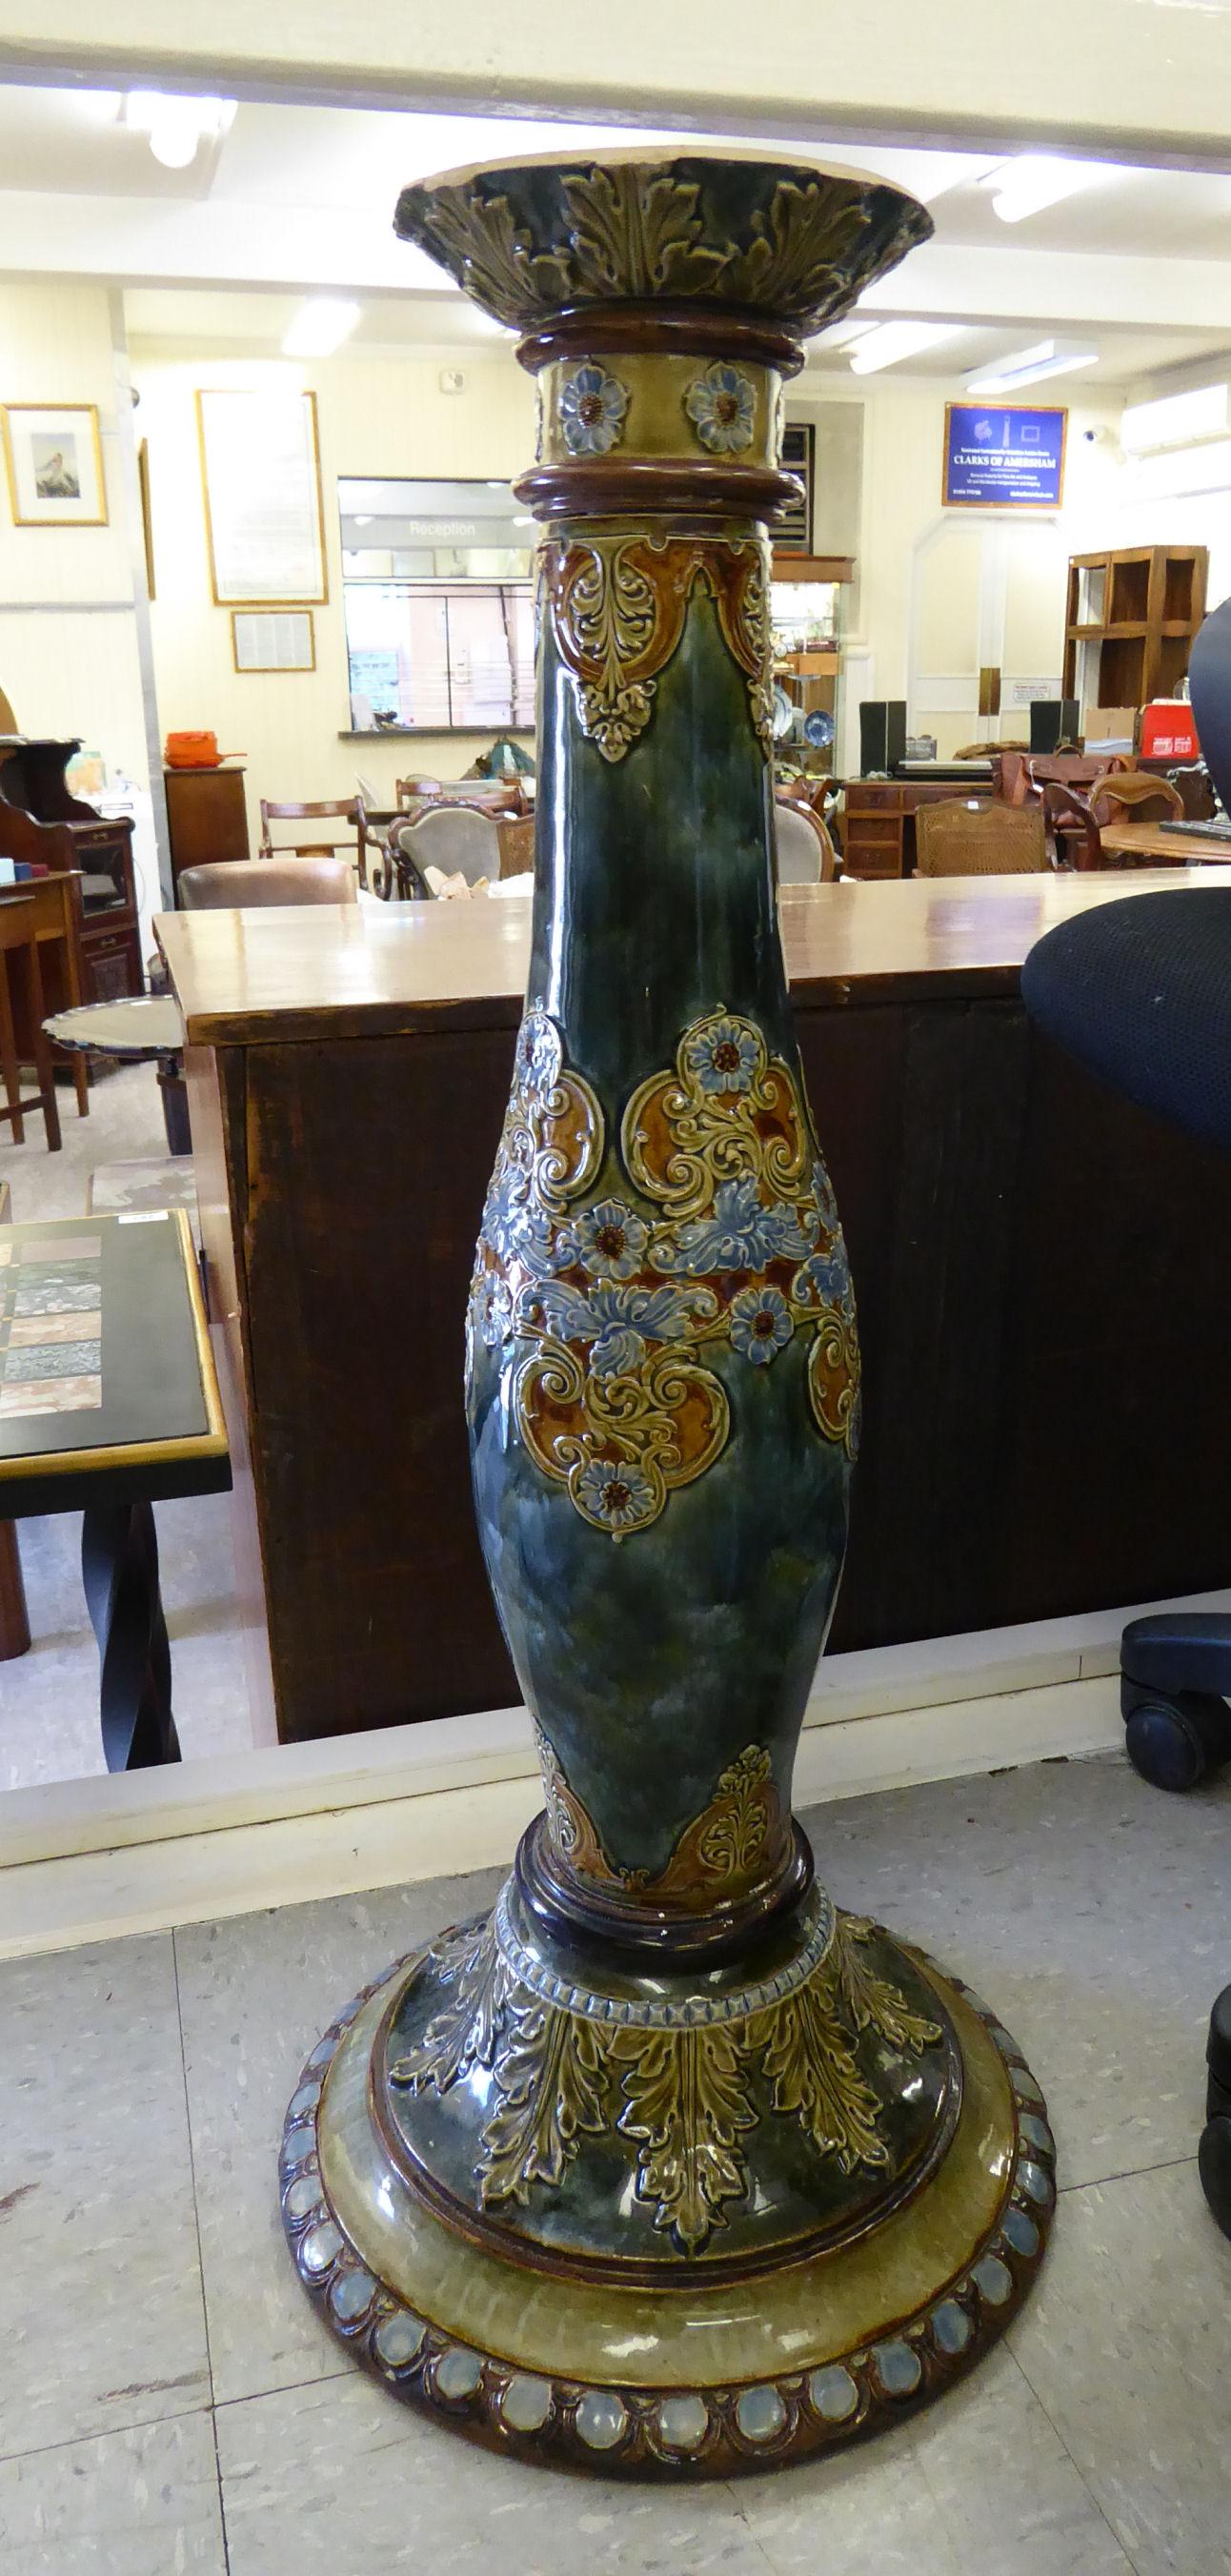 Lot 34 - An Art Nouveau period Royal Doulton stoneware jardiniere,